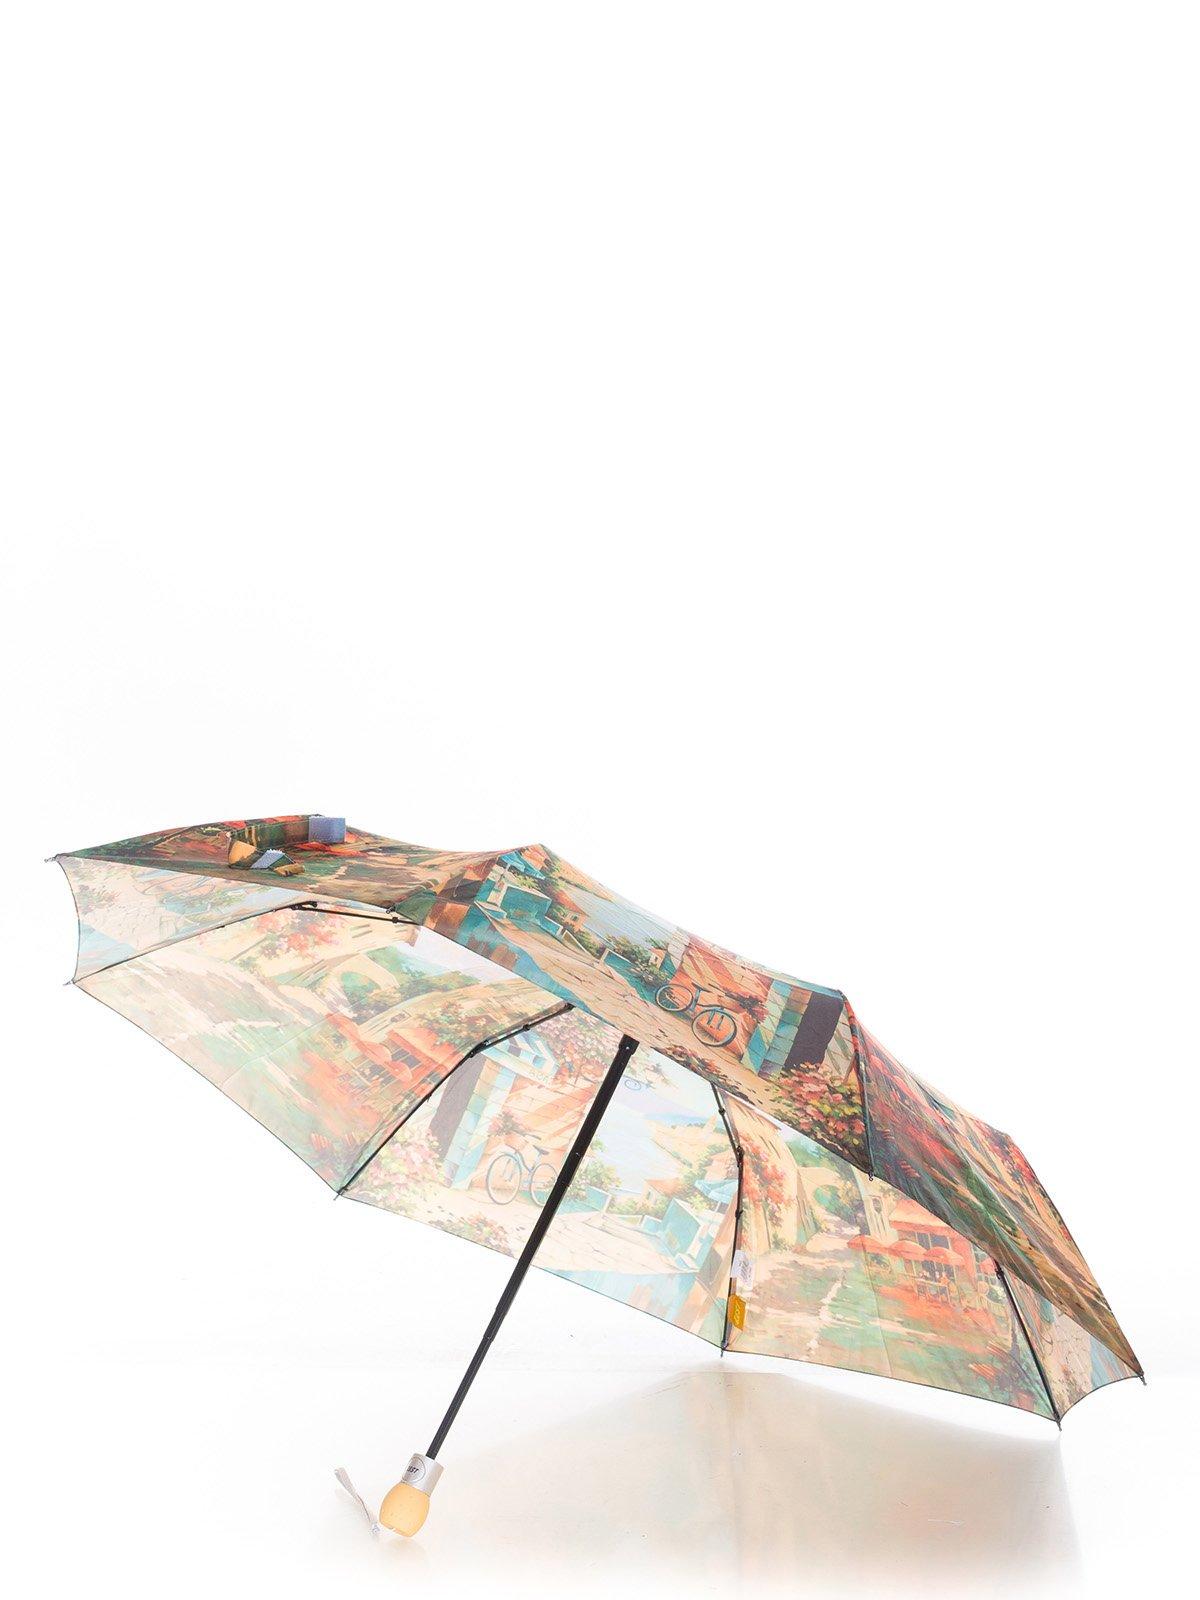 Зонт | 3296633 | фото 2